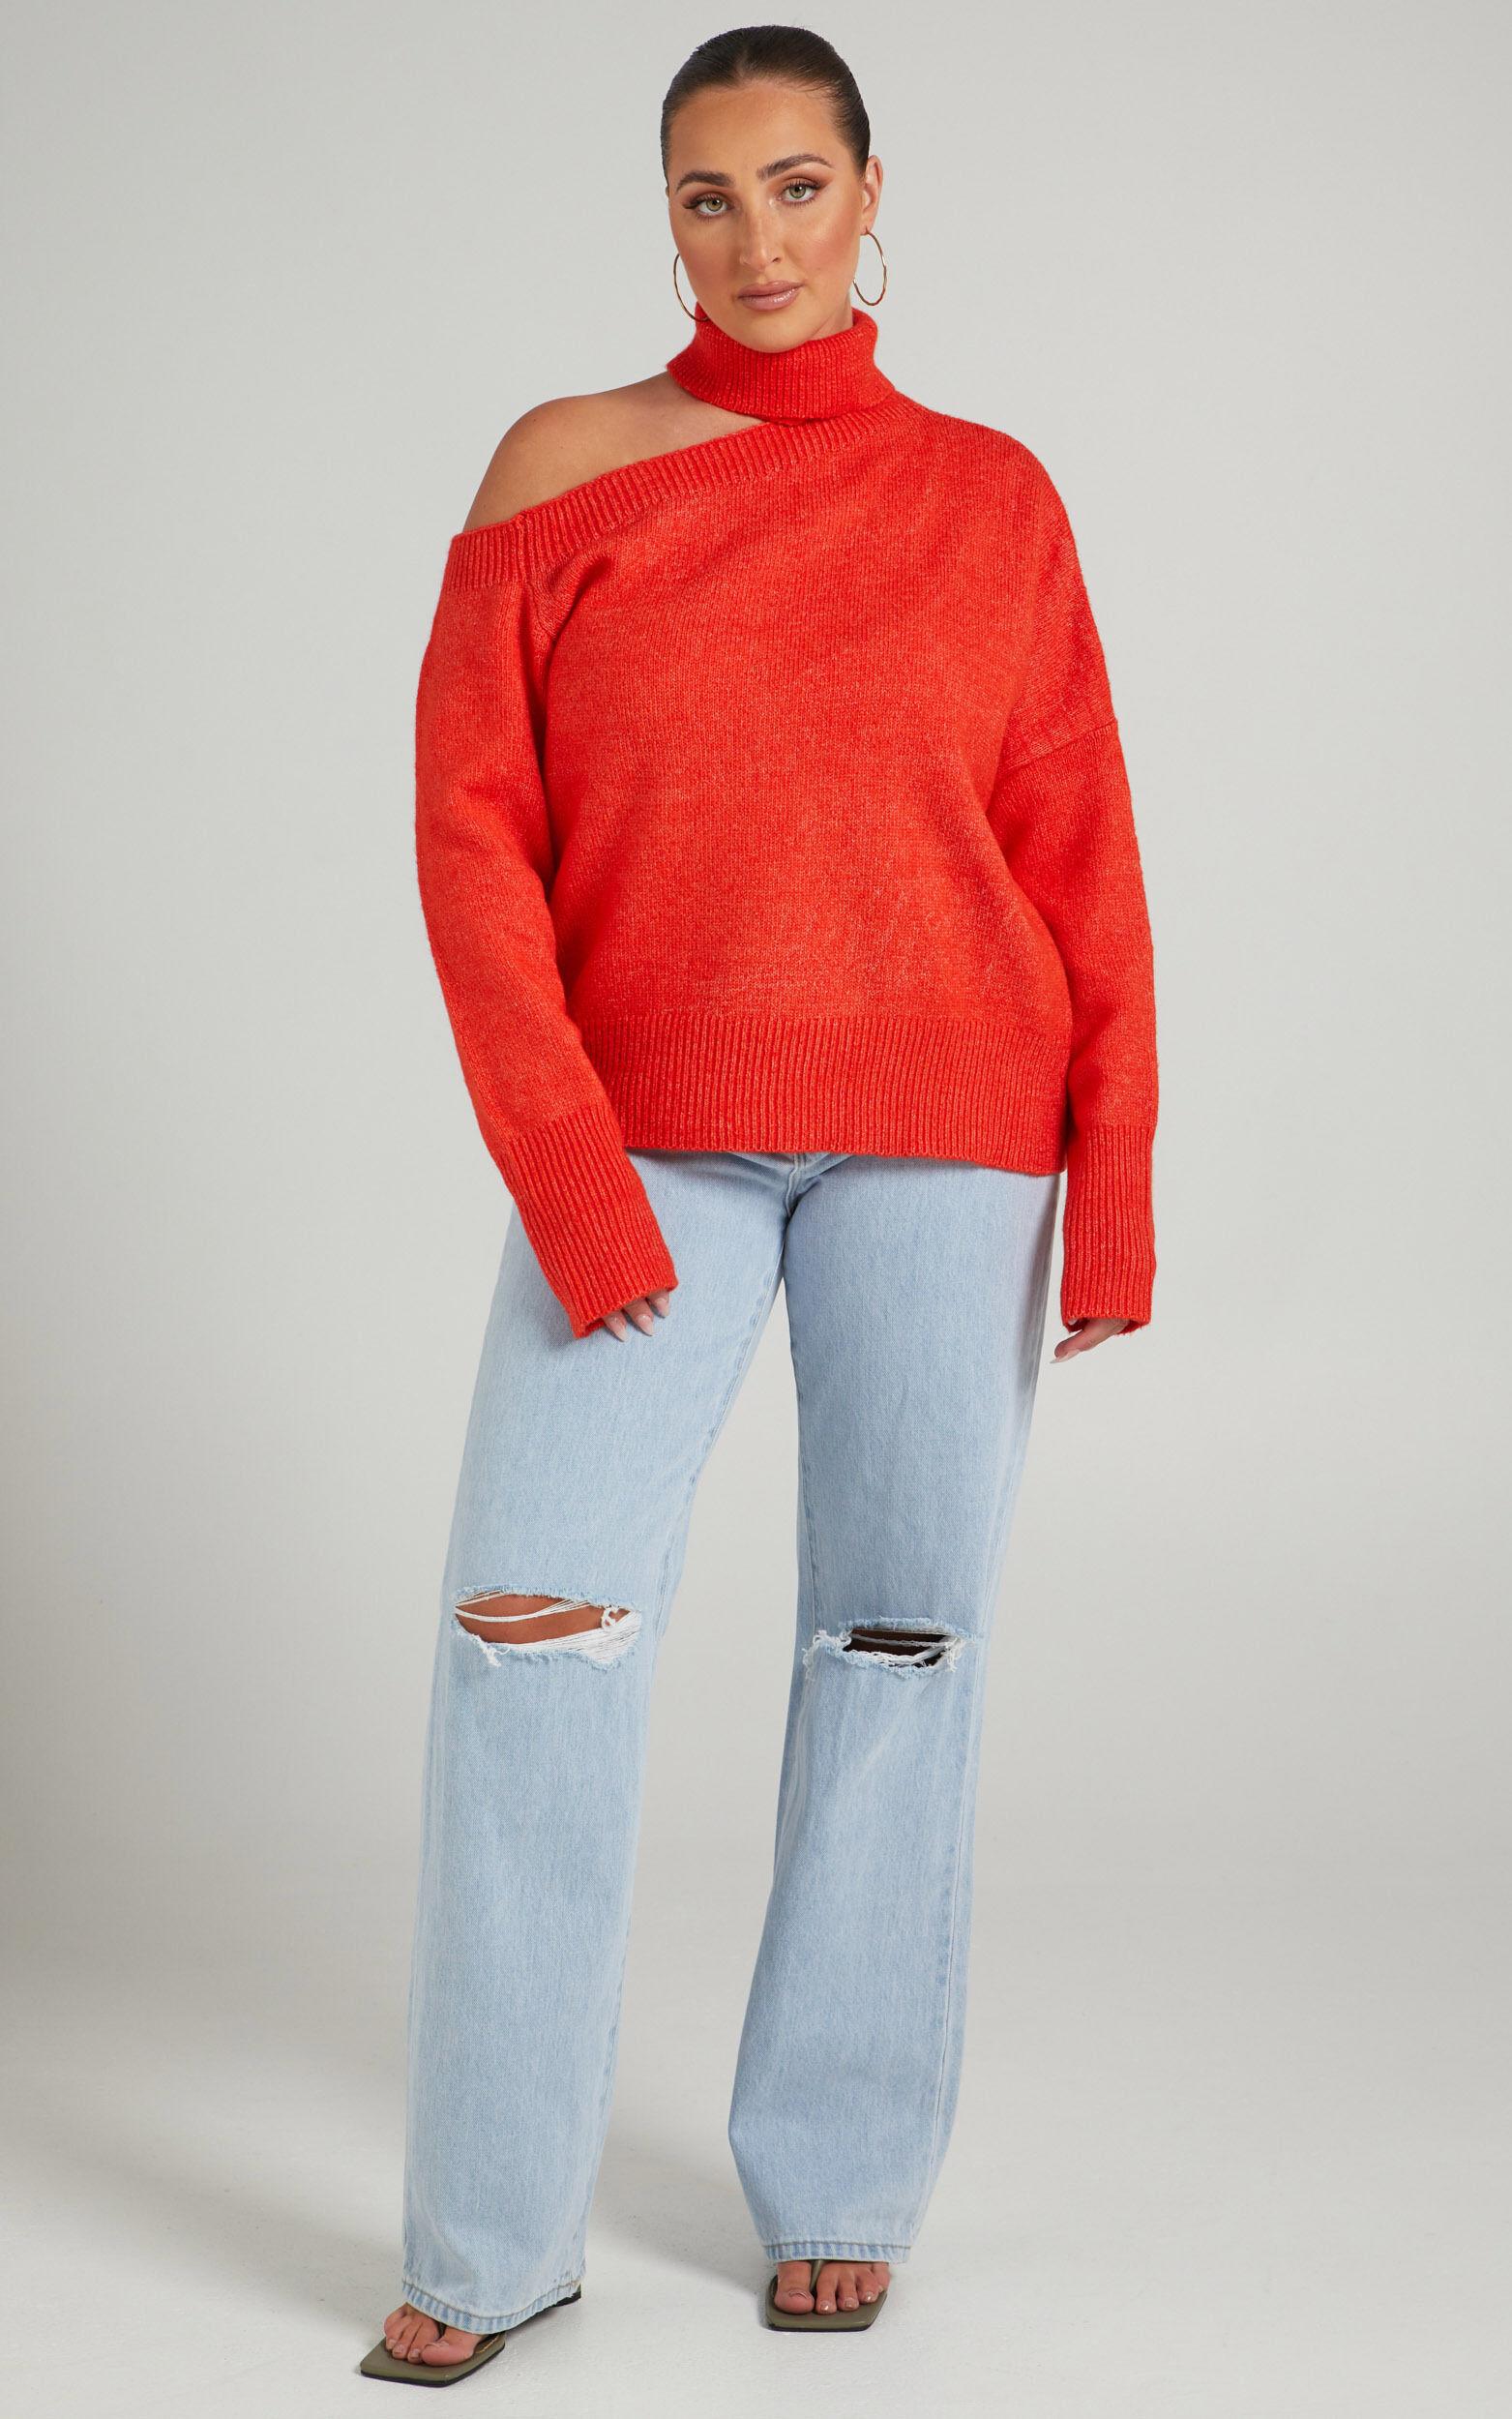 Ceila Knit Top with Shoulder Cut Out in Orange - 06, ORG2, super-hi-res image number null